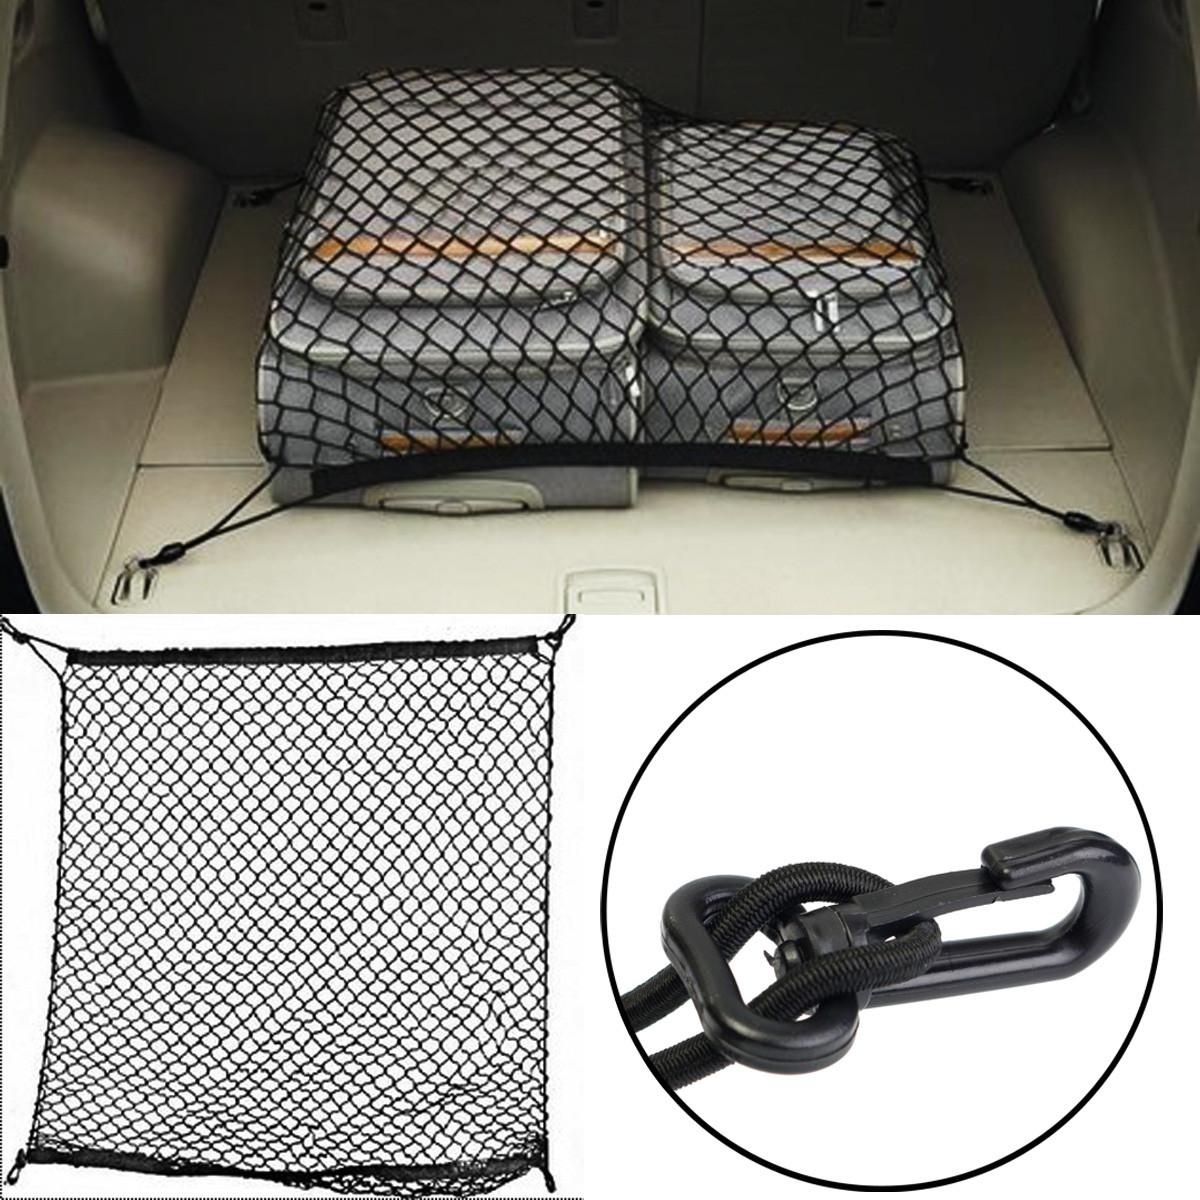 filet coffre arri re elastique bagage stockage rangement. Black Bedroom Furniture Sets. Home Design Ideas